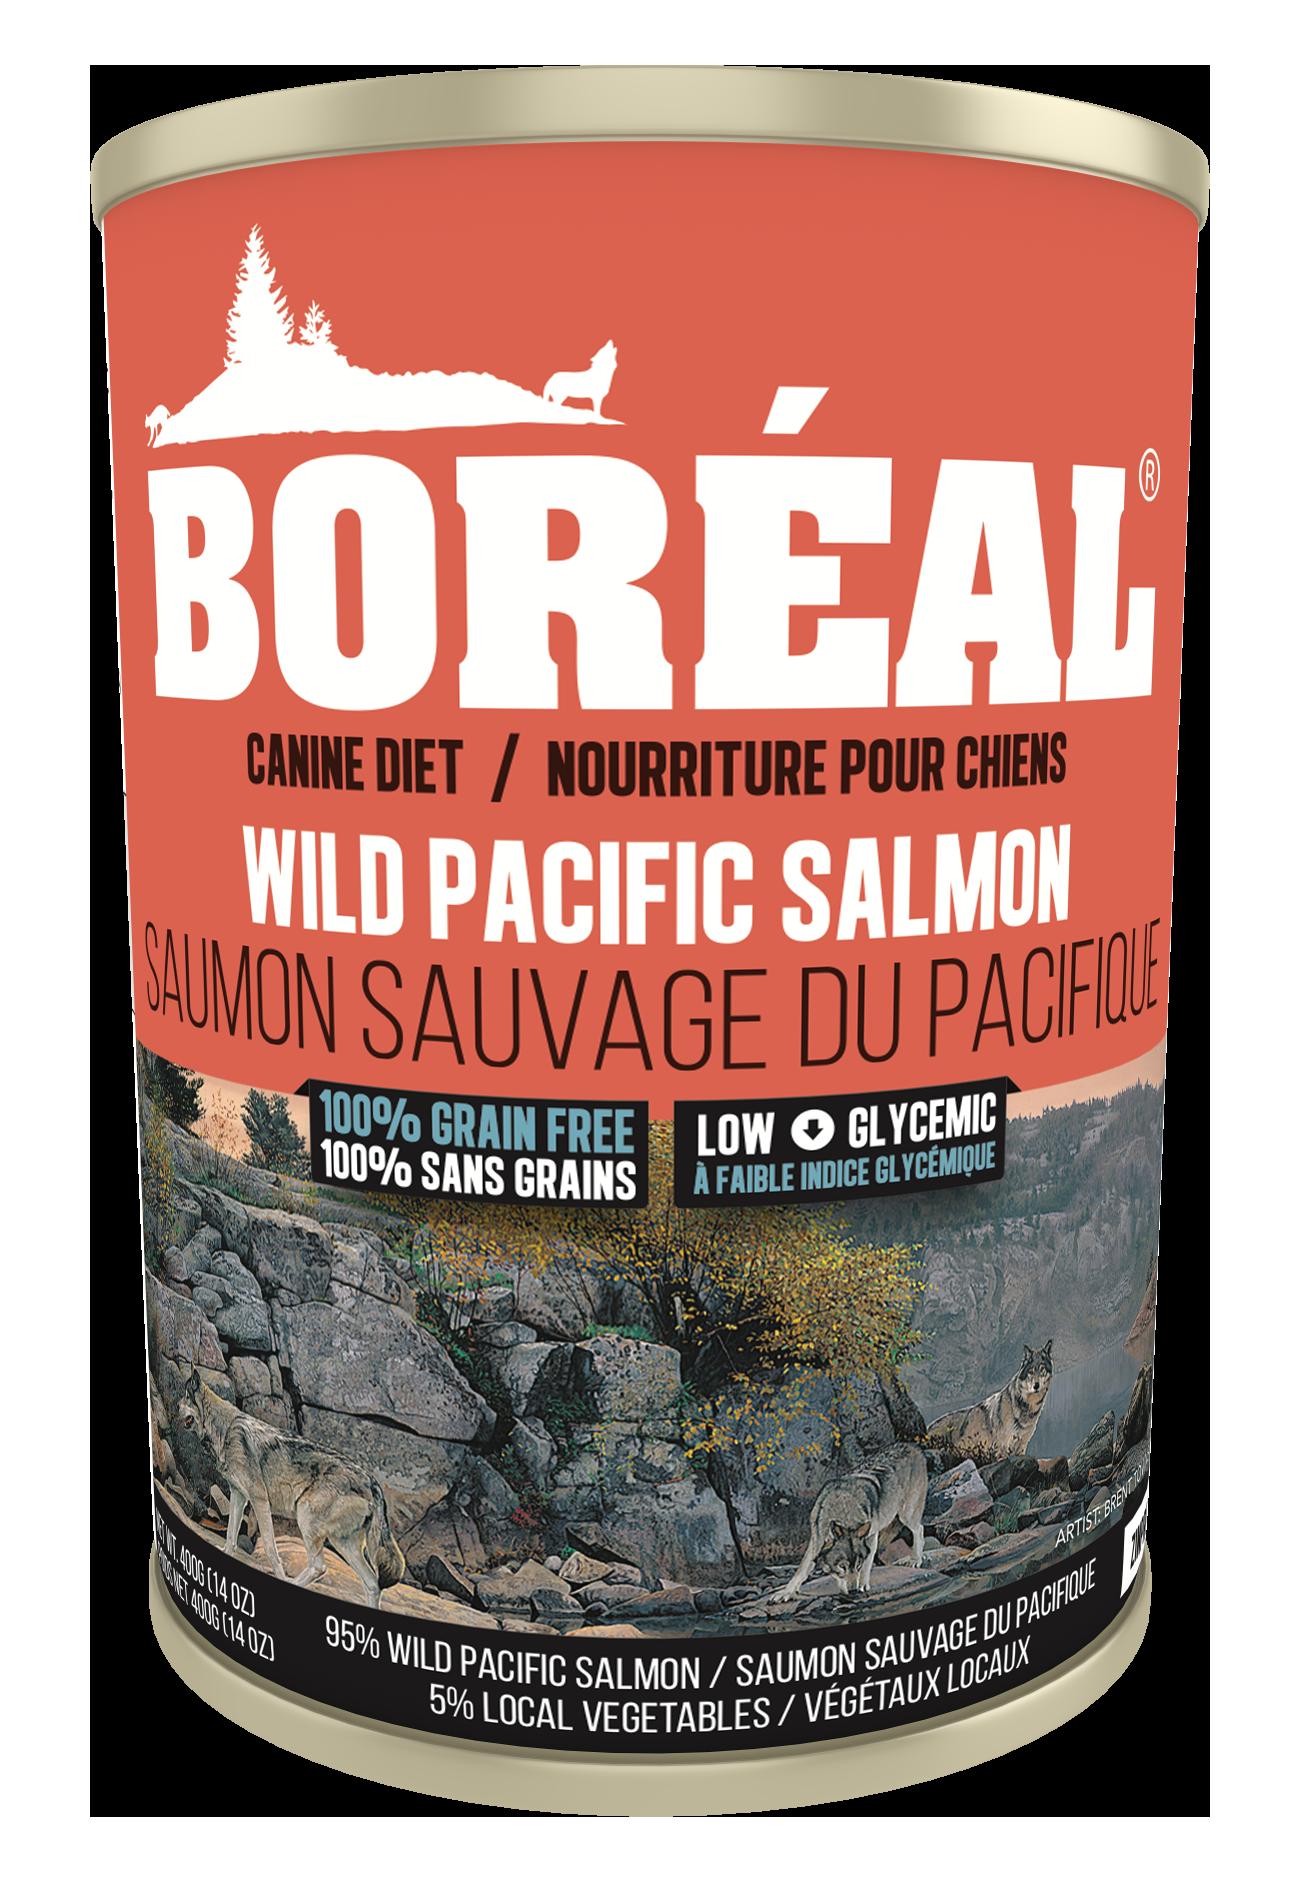 Boreal Grain-Free Big Bear Wild Pacific Salmon Canned Dog Food, 690-gram